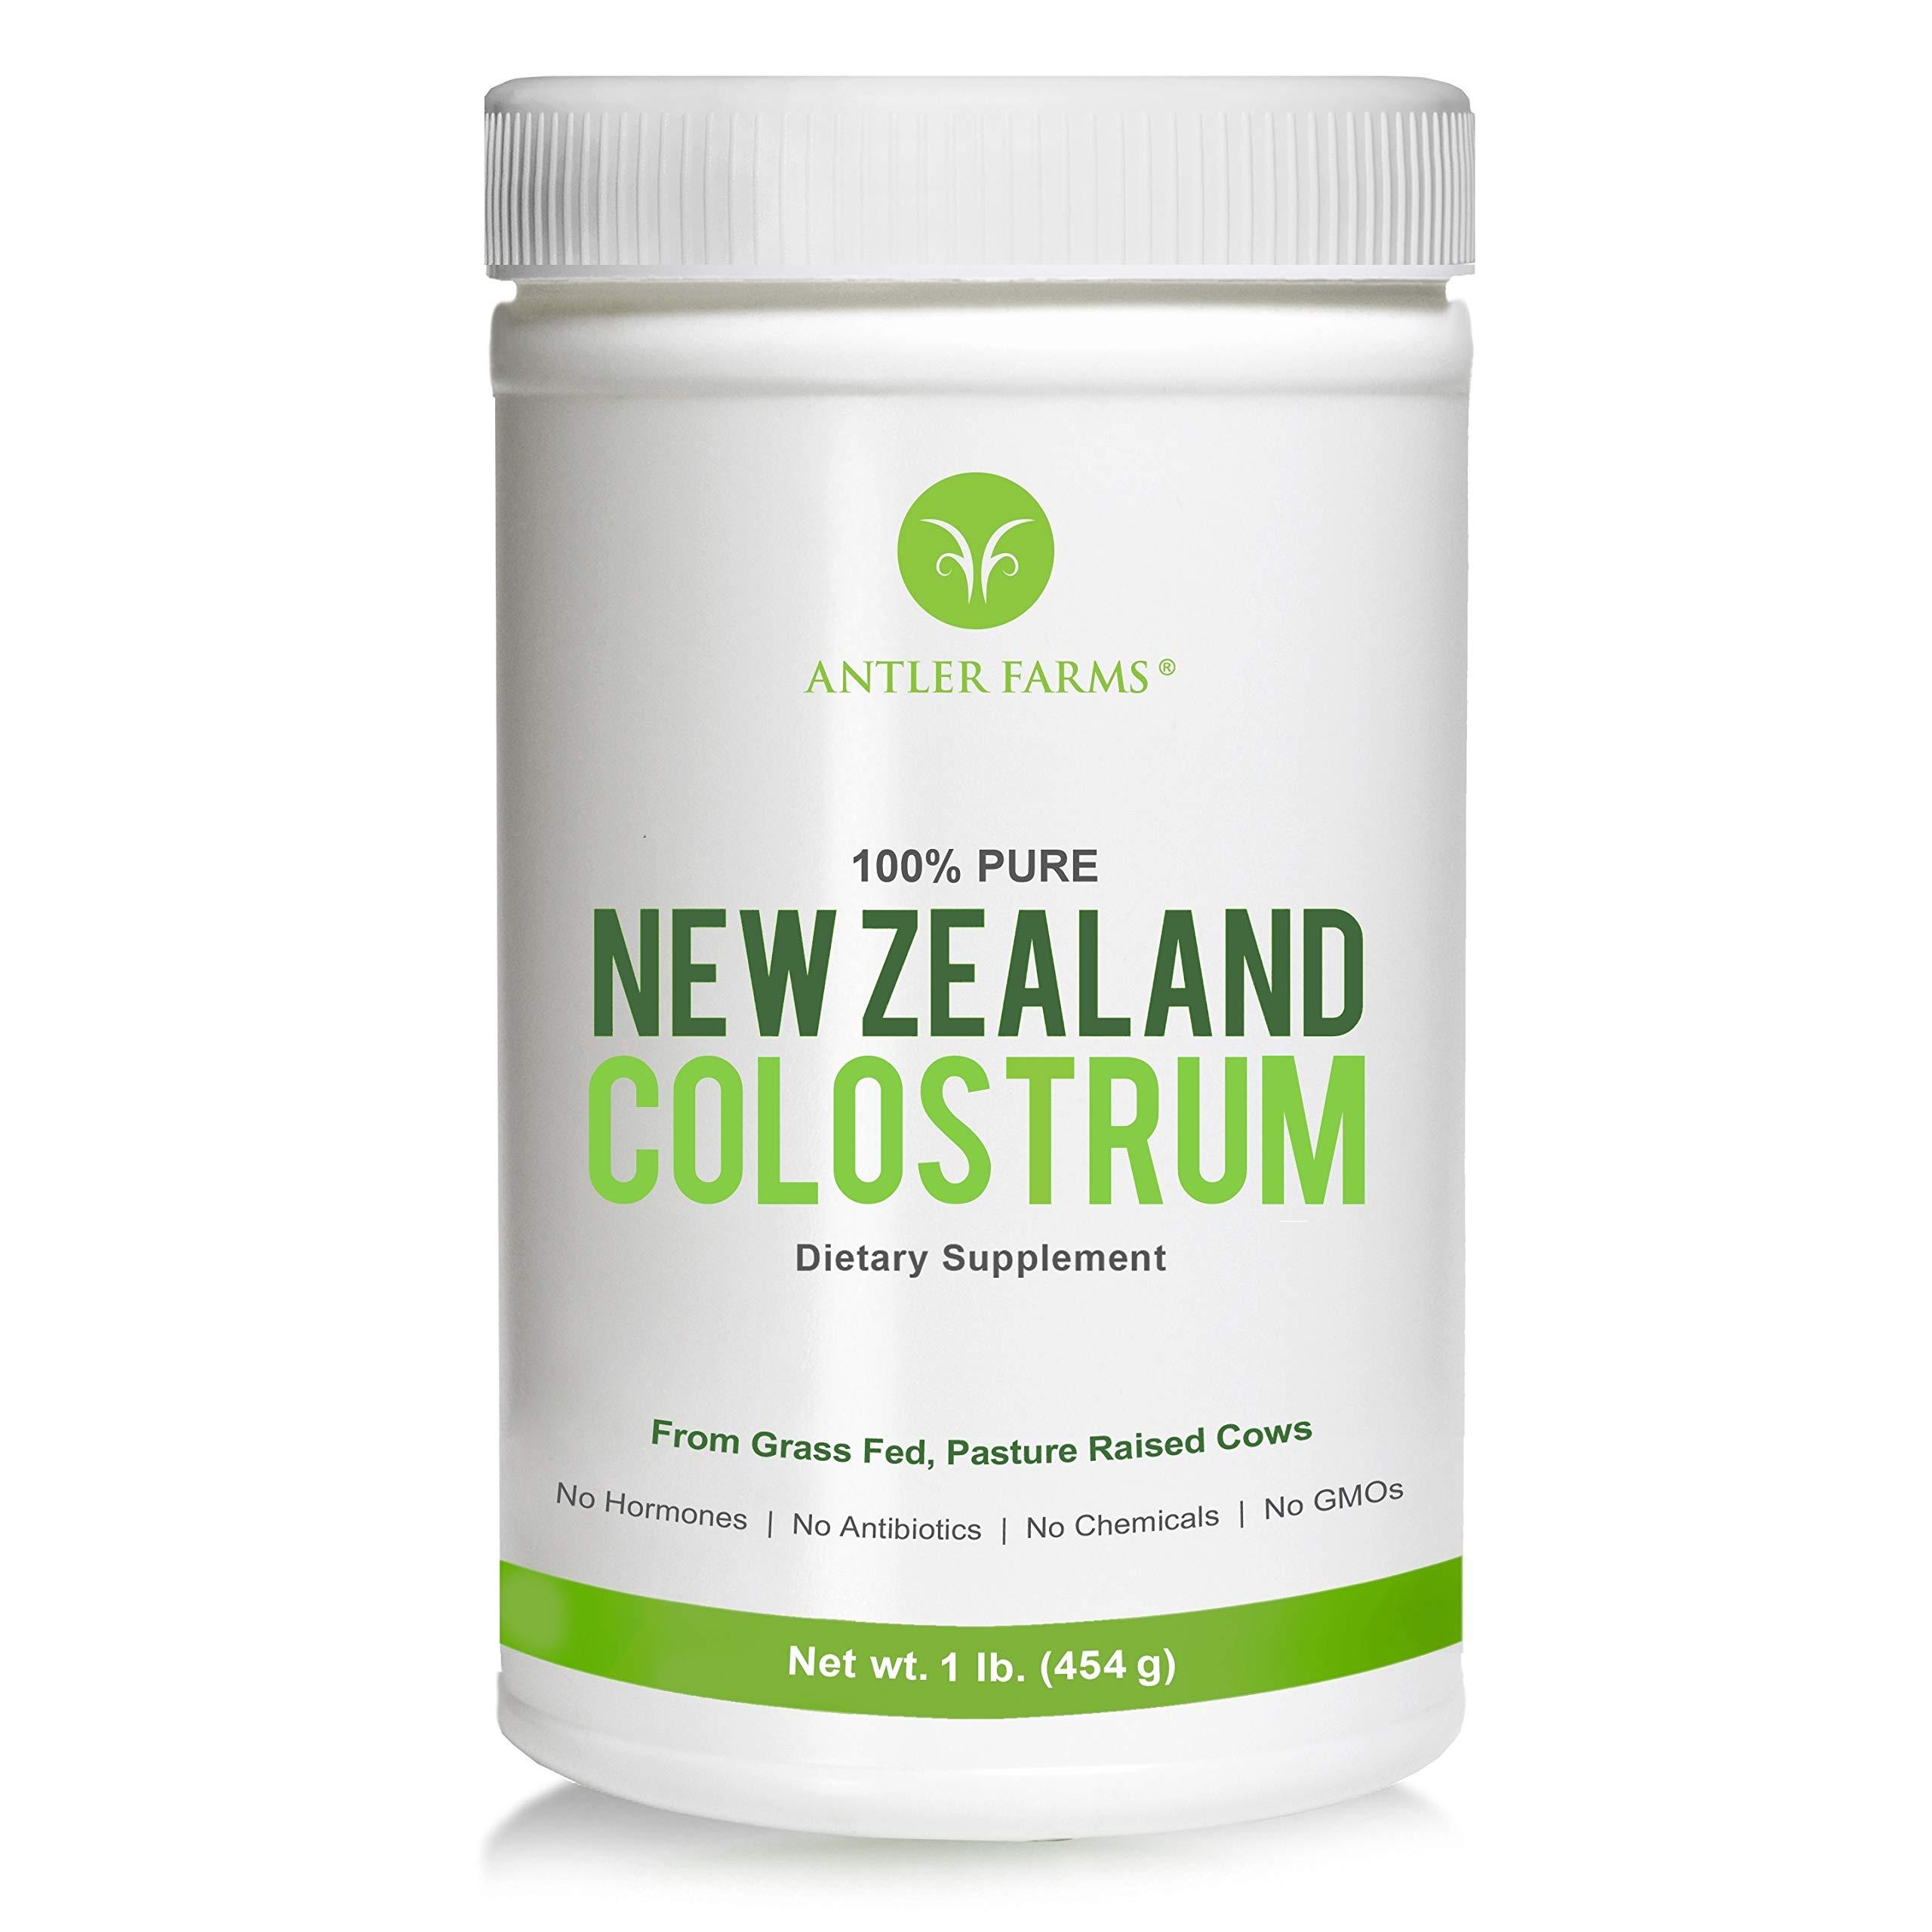 Antler Farms 100% Pure New Zealand Colostrum, 30 Servings, 1 lb - Grass Fed, Pasture Raised, Clean Sourced, Cold Processed, NO Hormones, NO Antibiotics, NO Chemicals, NO GMOs